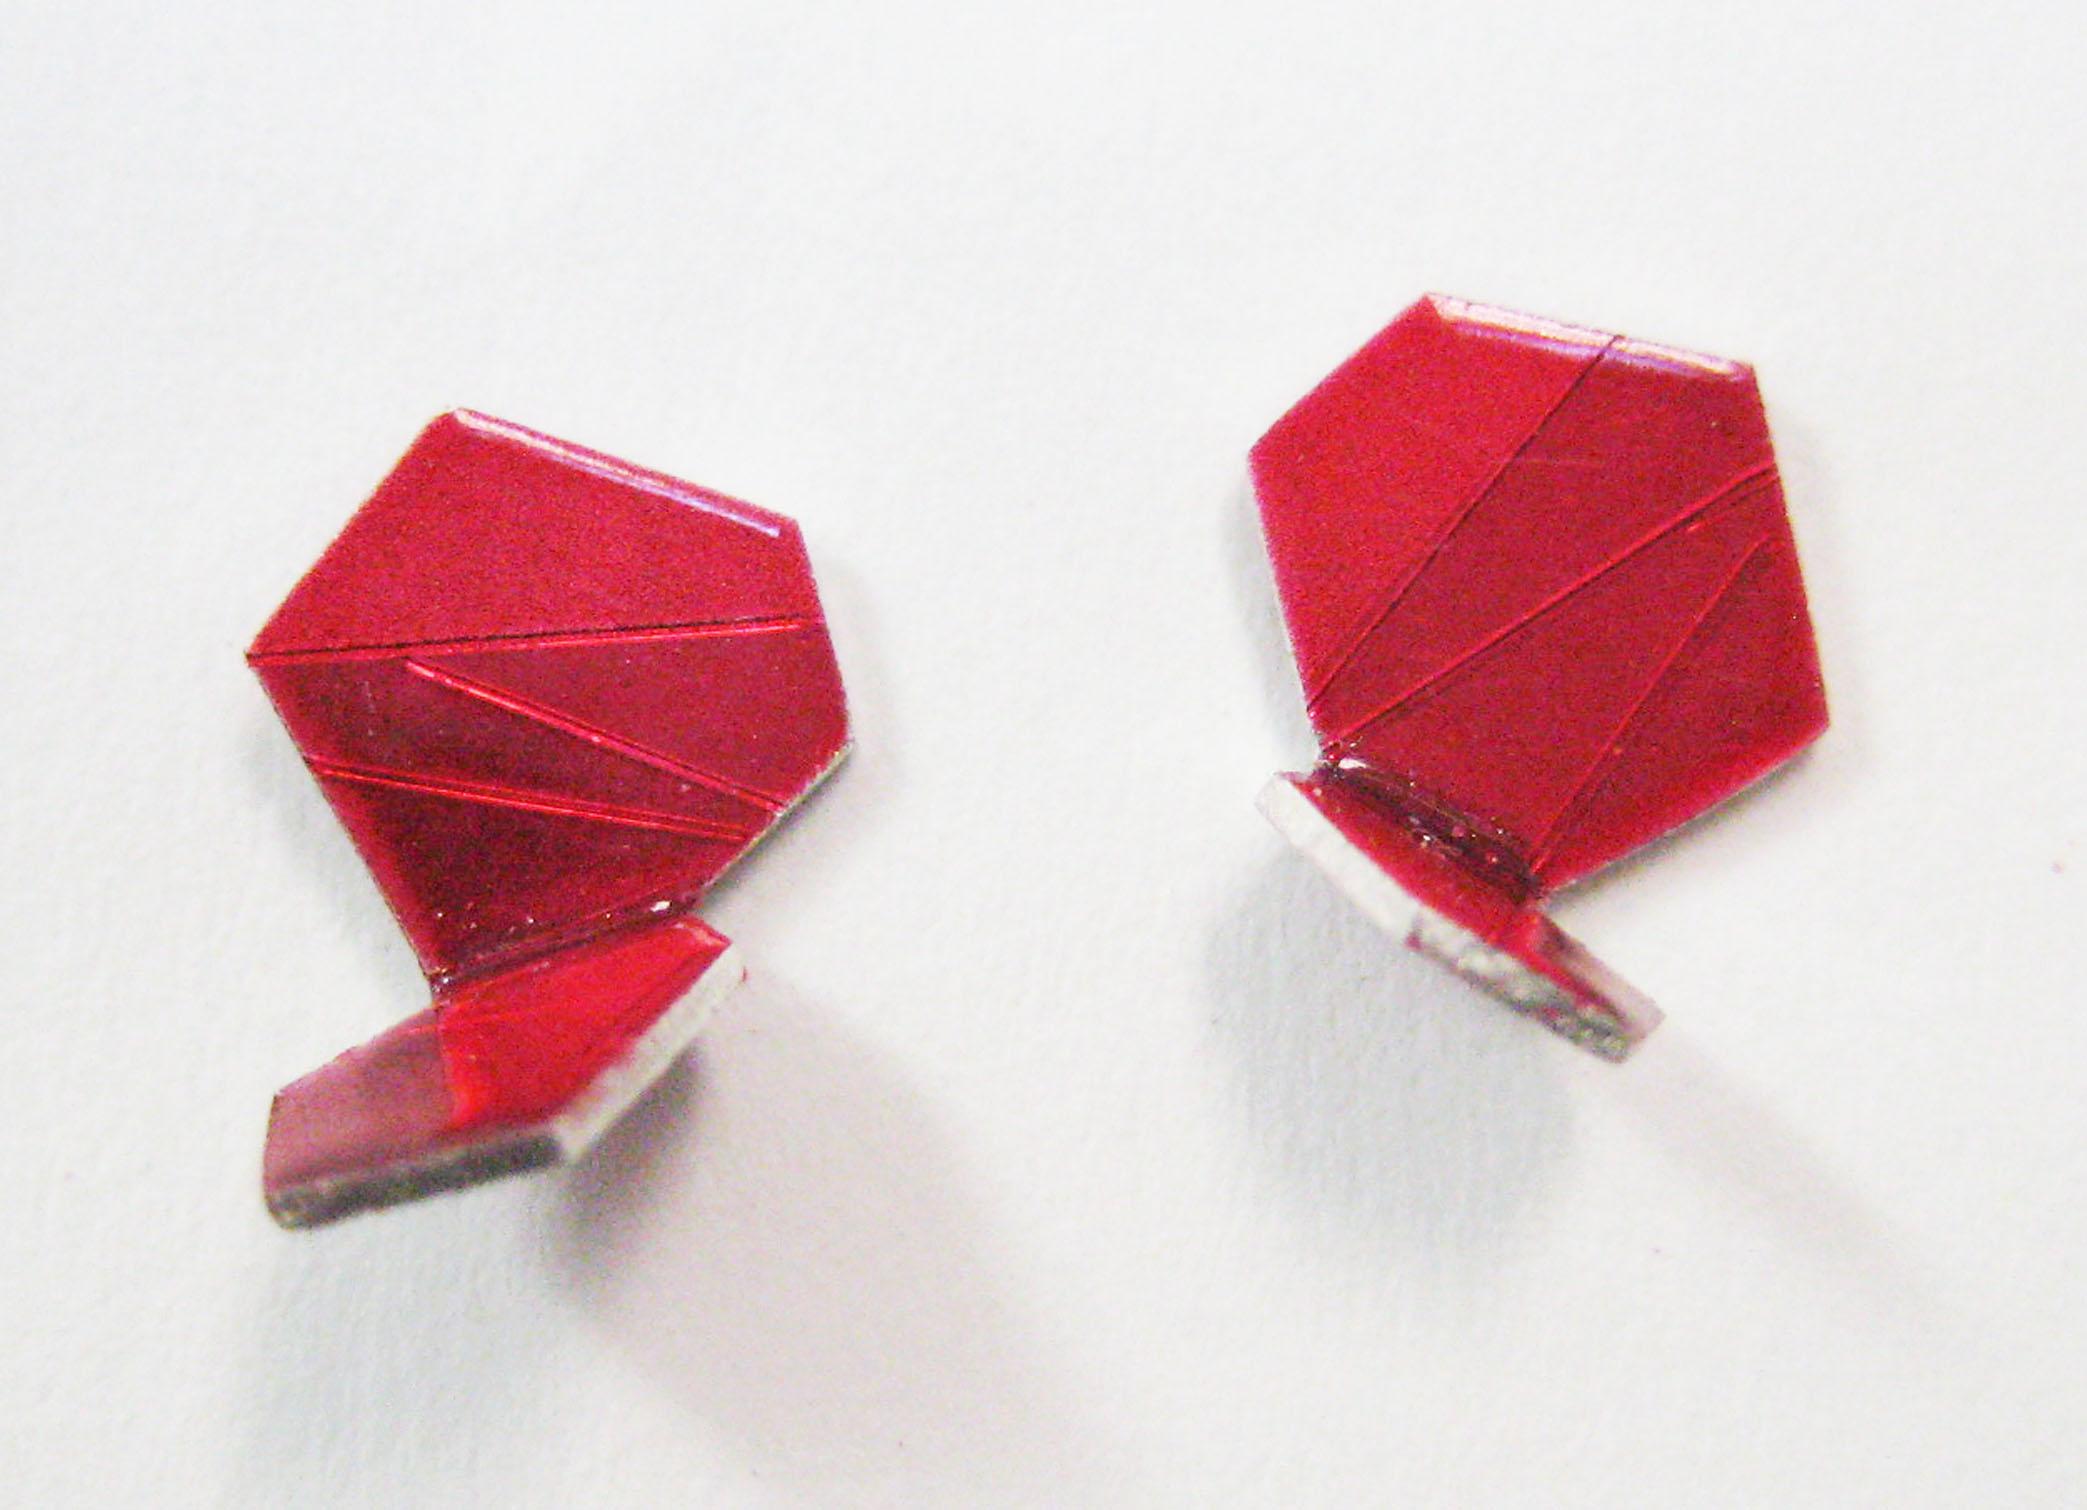 9-Small Red Ear Gems-Voegele.jpg